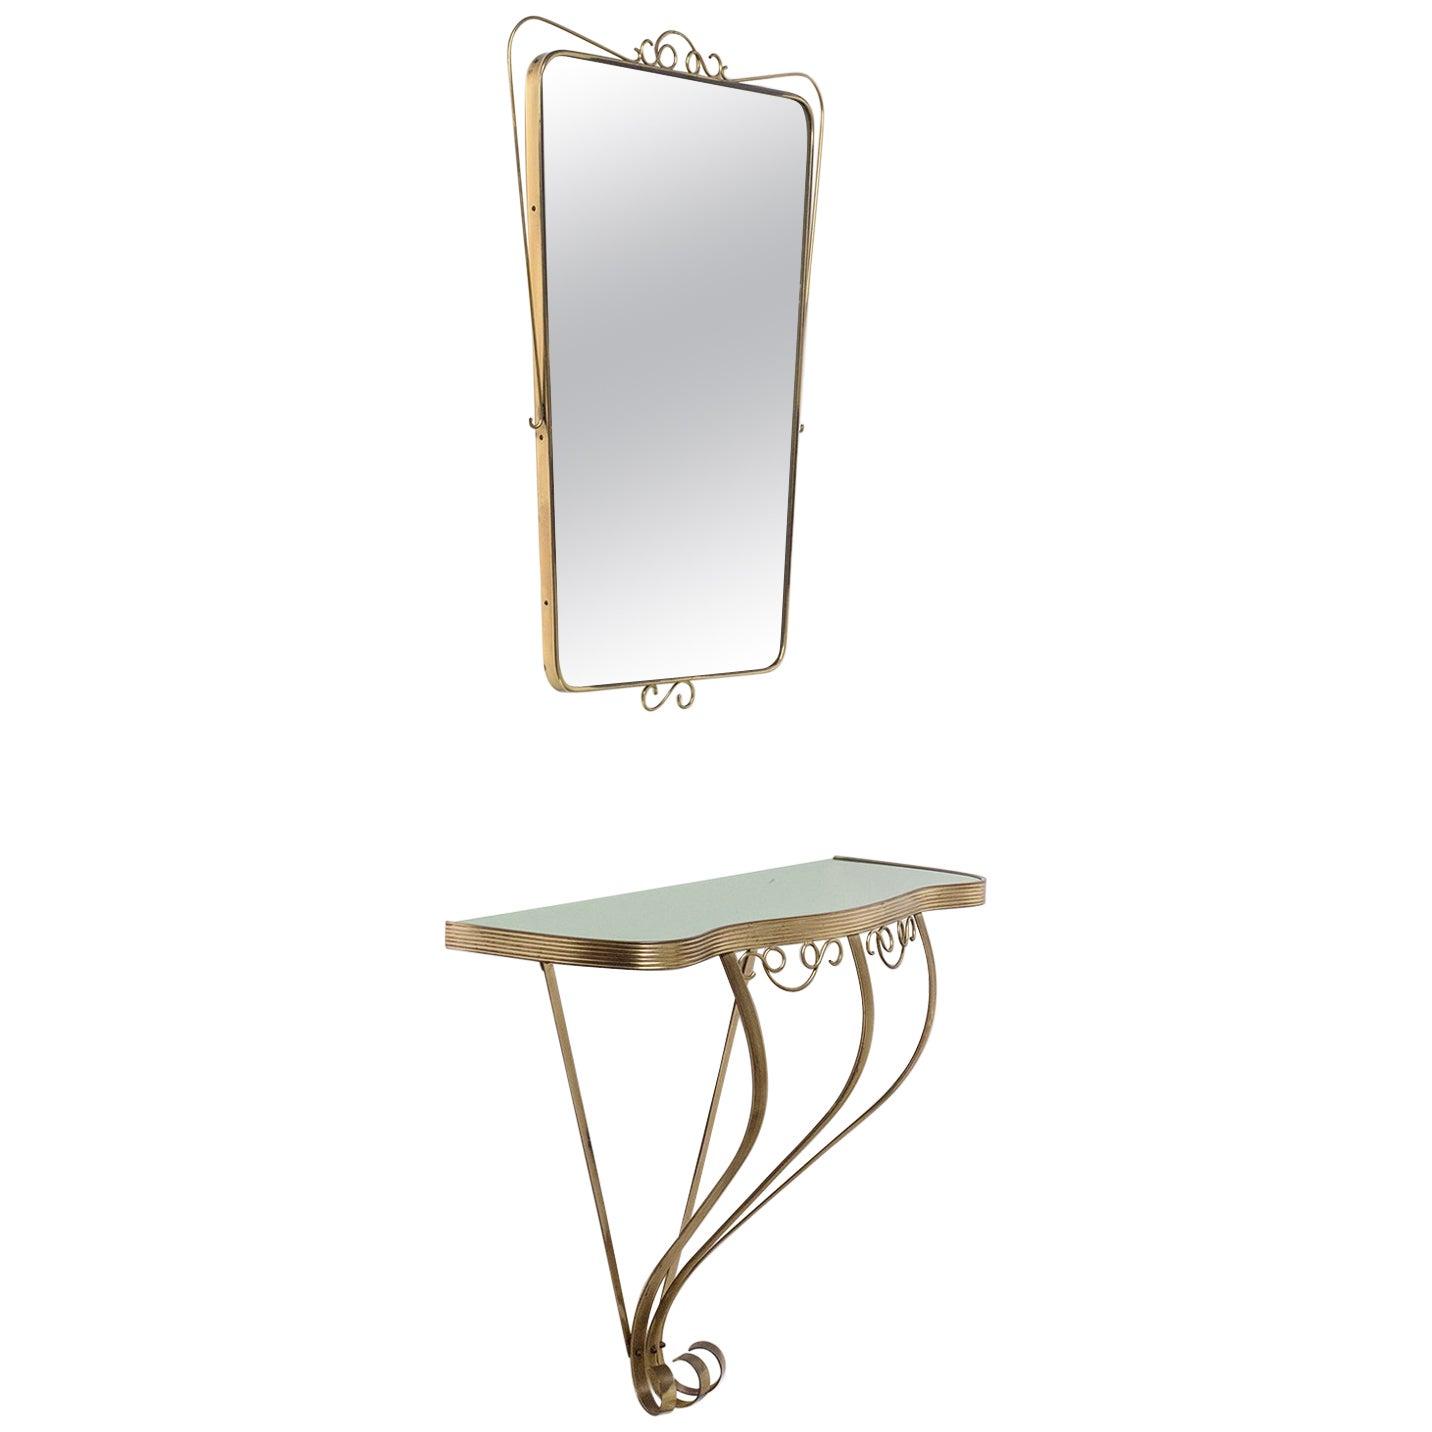 Italian Brass Mirror and Console, 1940s